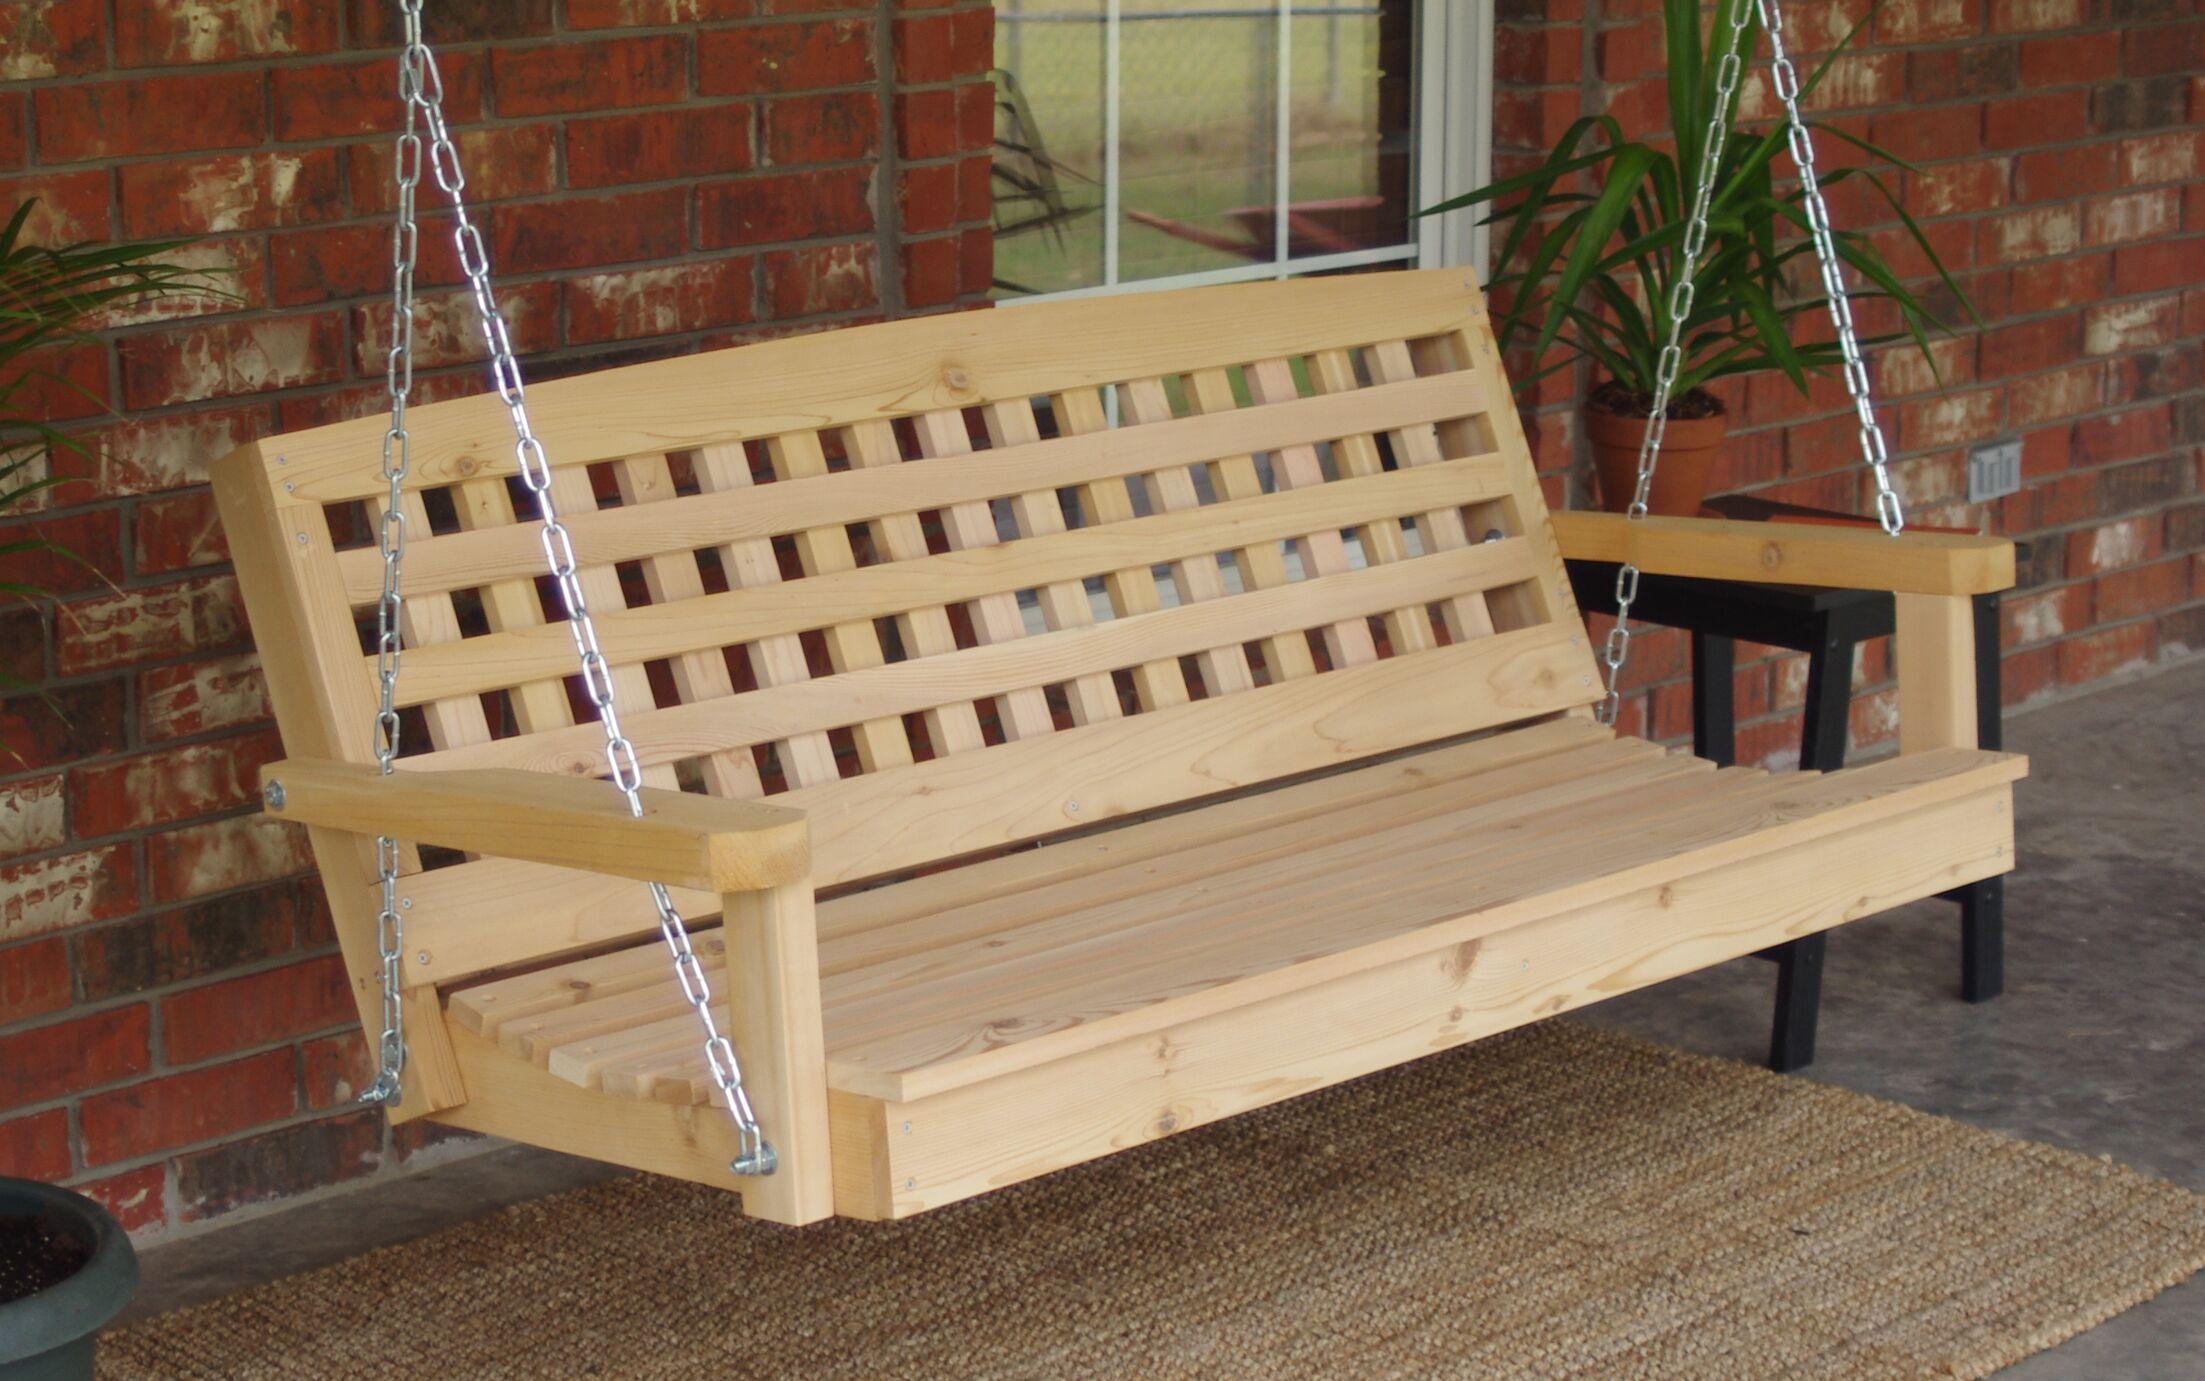 Hinderliter Lattice Back Cedar Porch Swing Finish: Natural/Stainless Steel , Size: 24